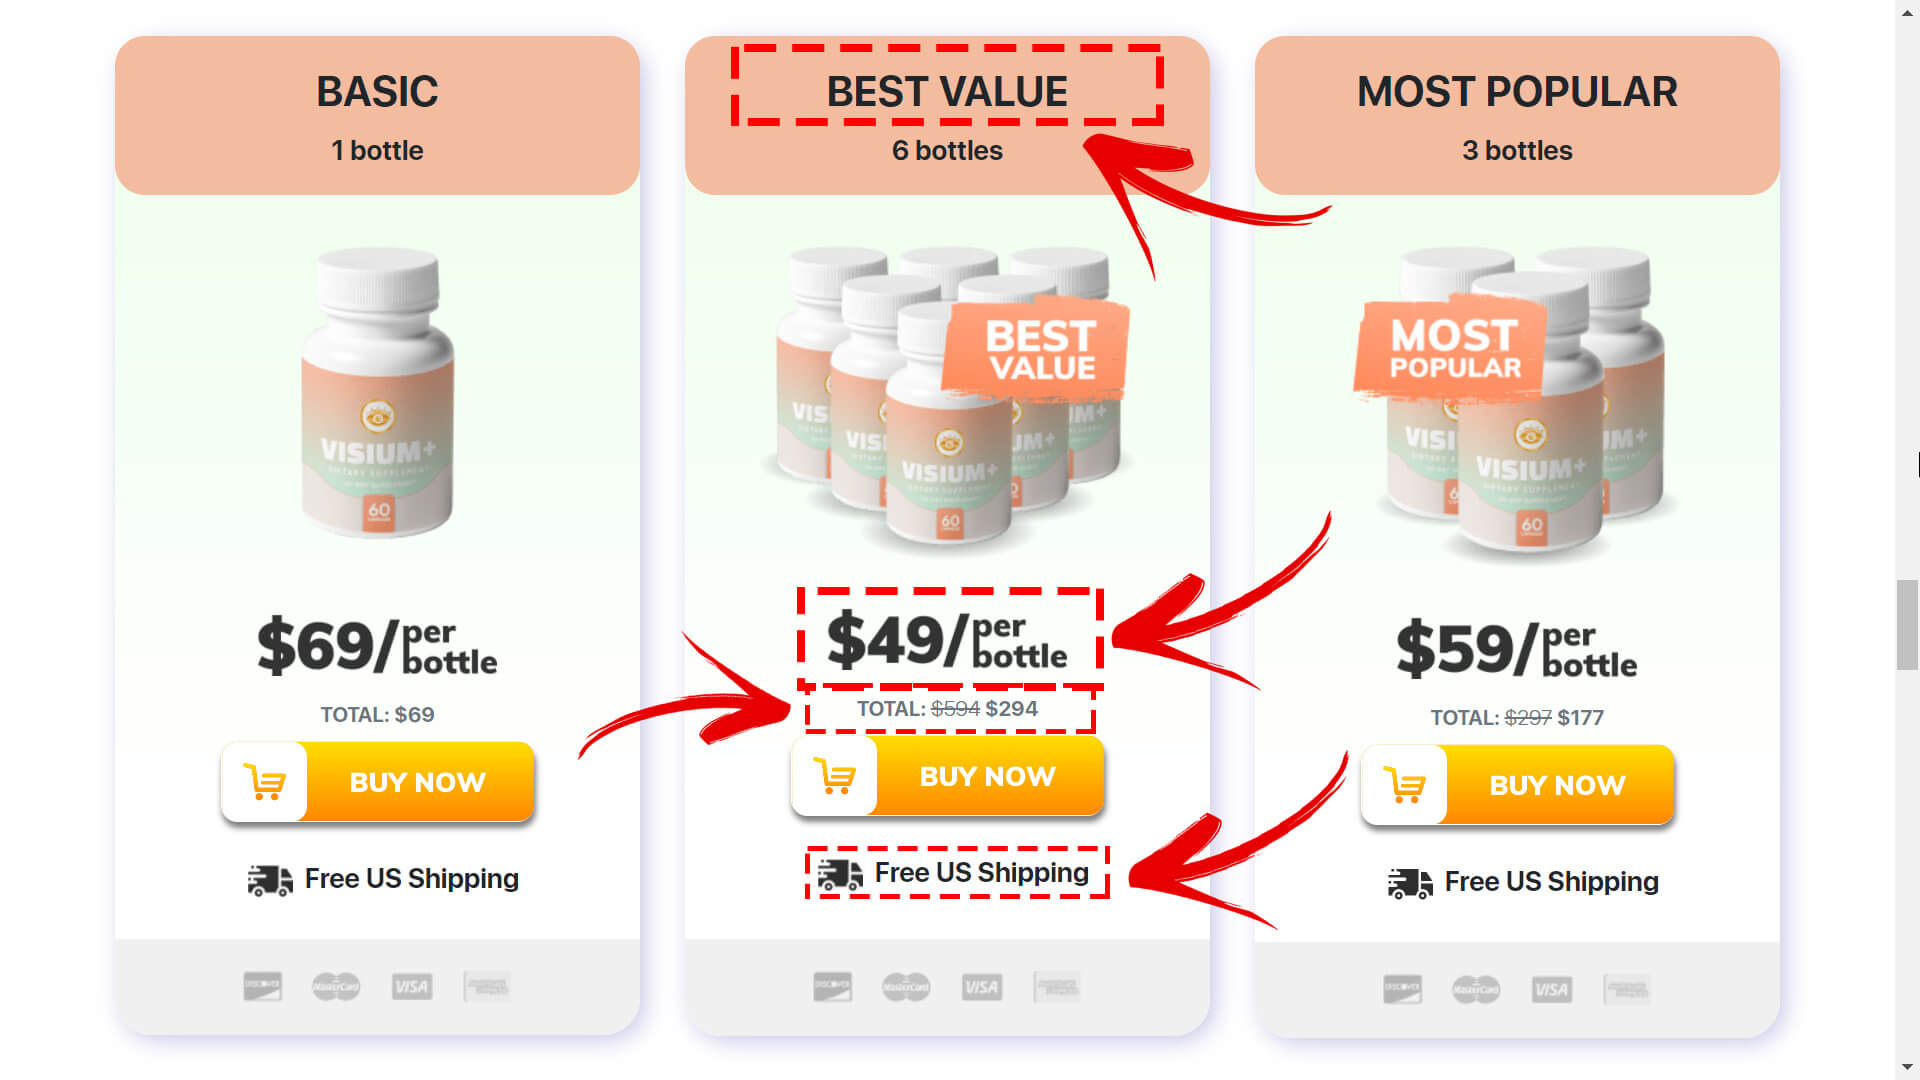 How to buy Visium Plus step 2